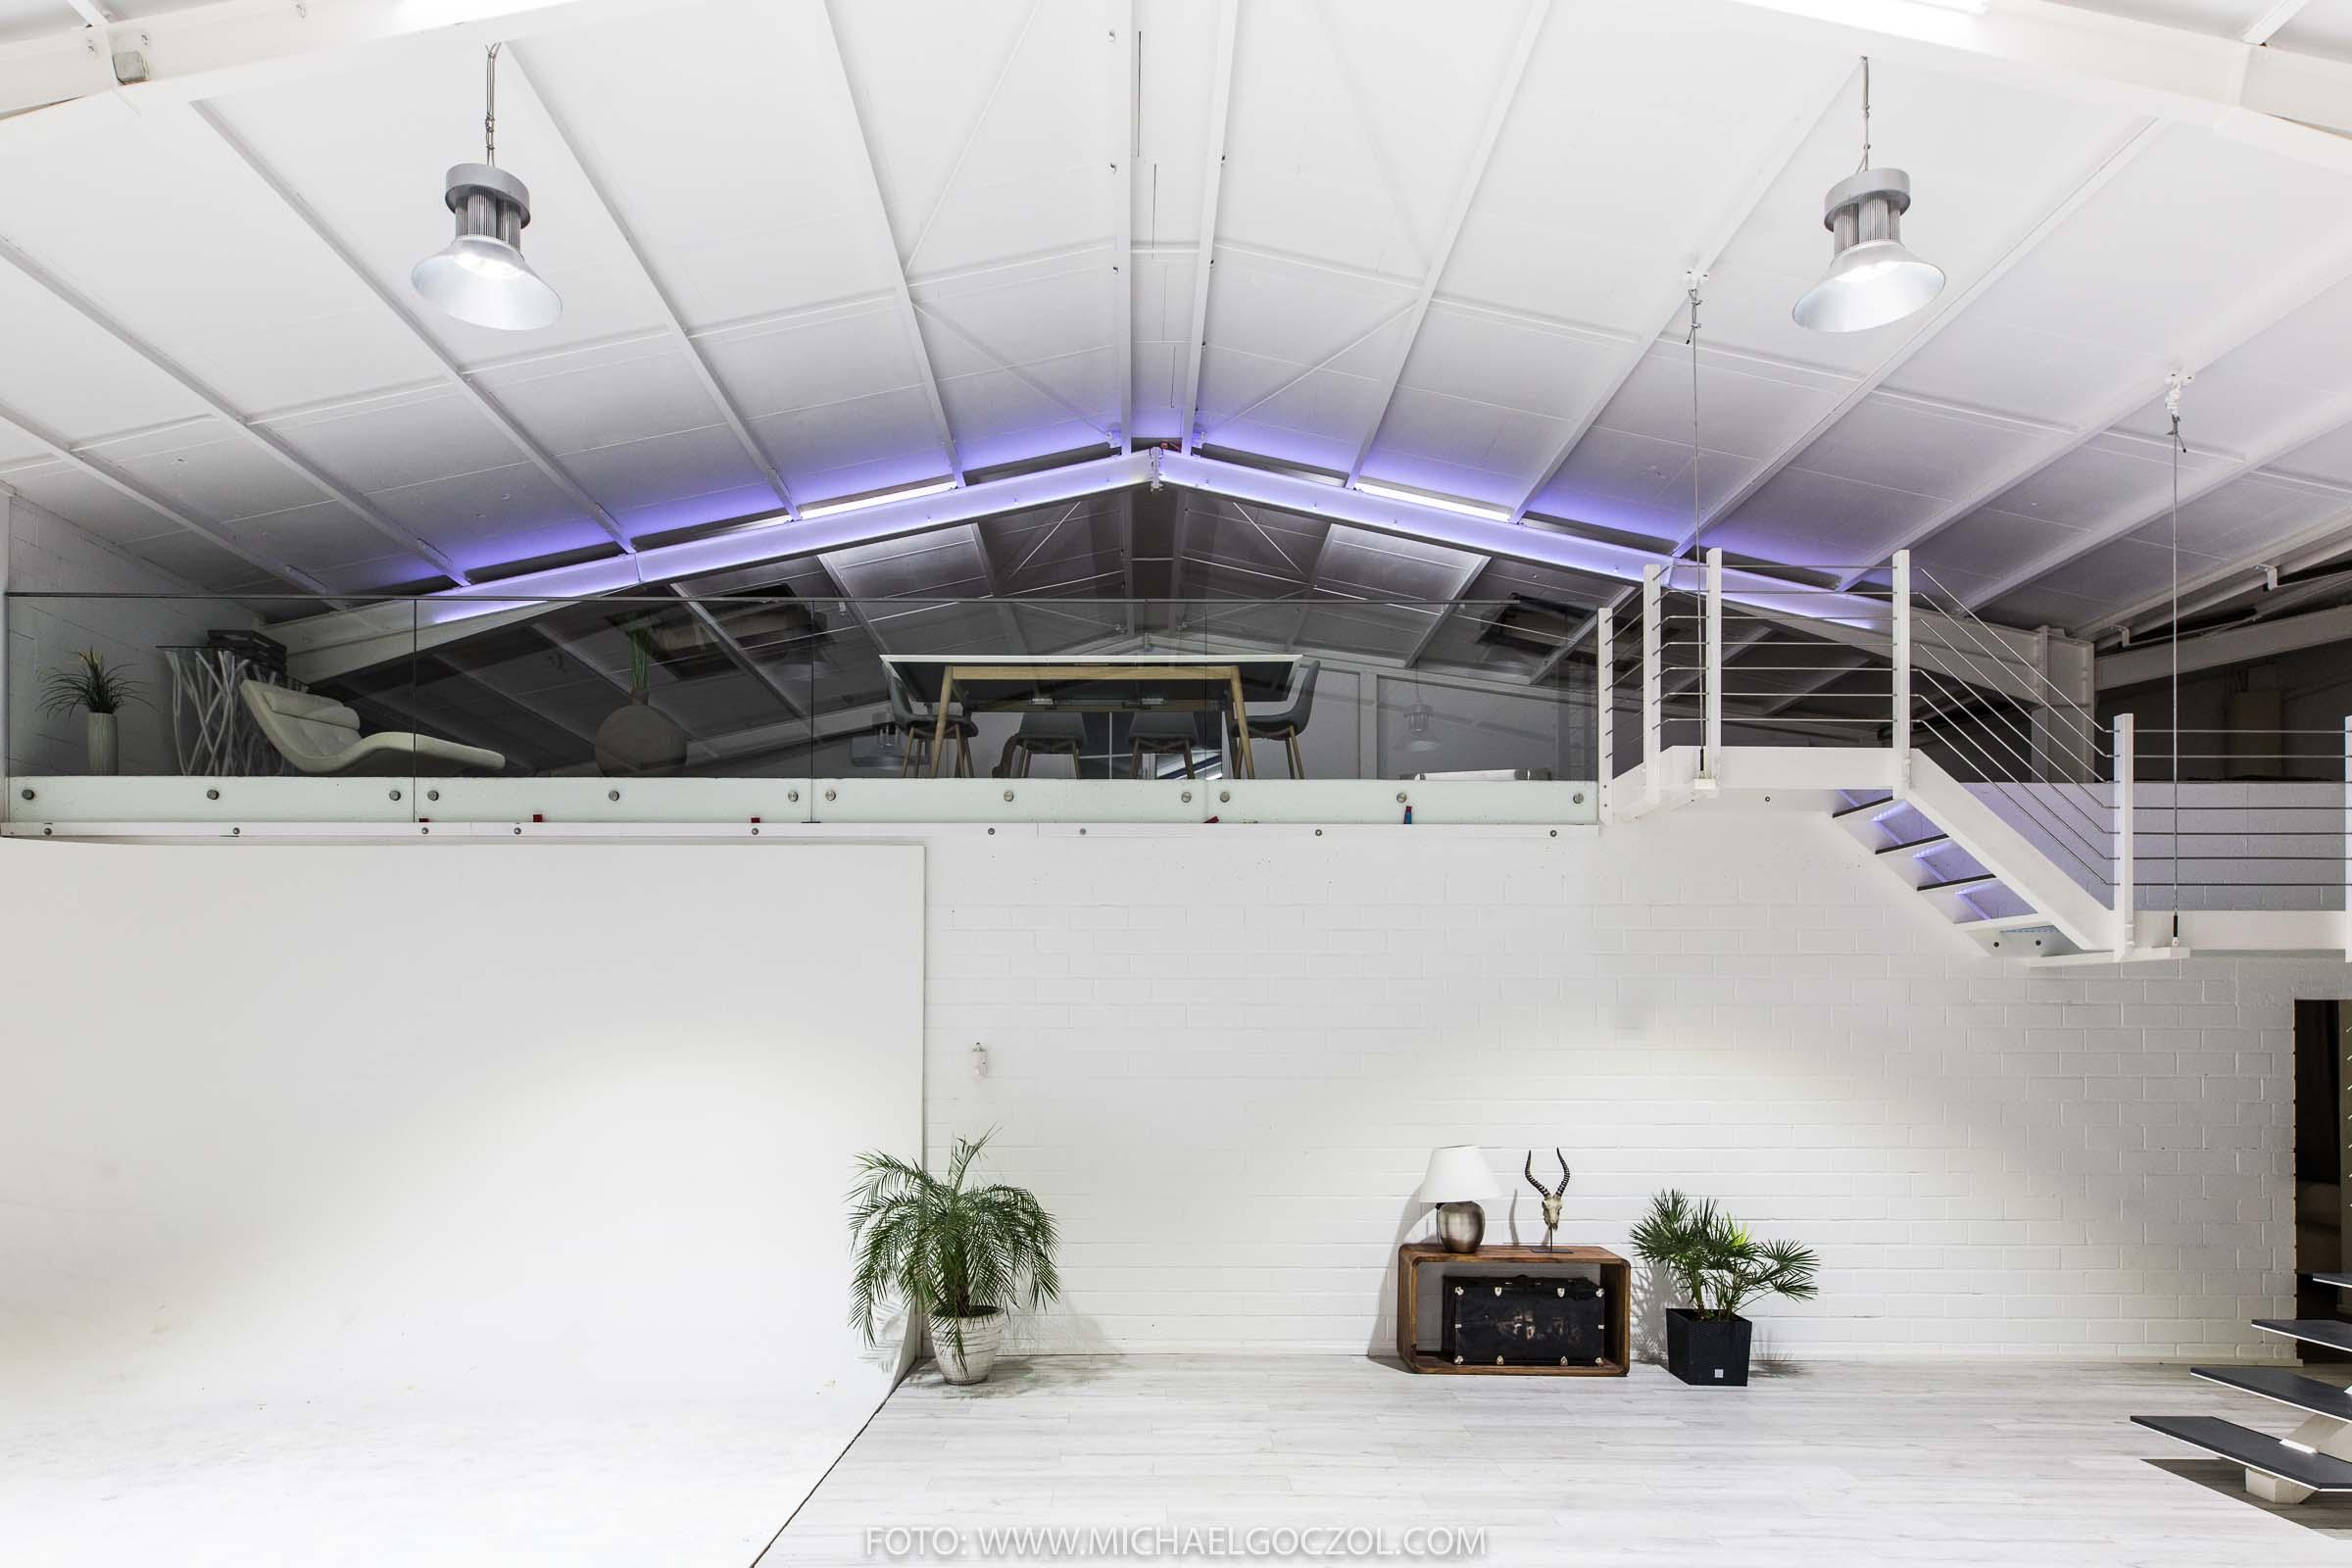 RoofOneStudio Mietstudio Fotostudio Eventlocation Loft Industrieloft Studio Frankfurt am main Oberursel 31